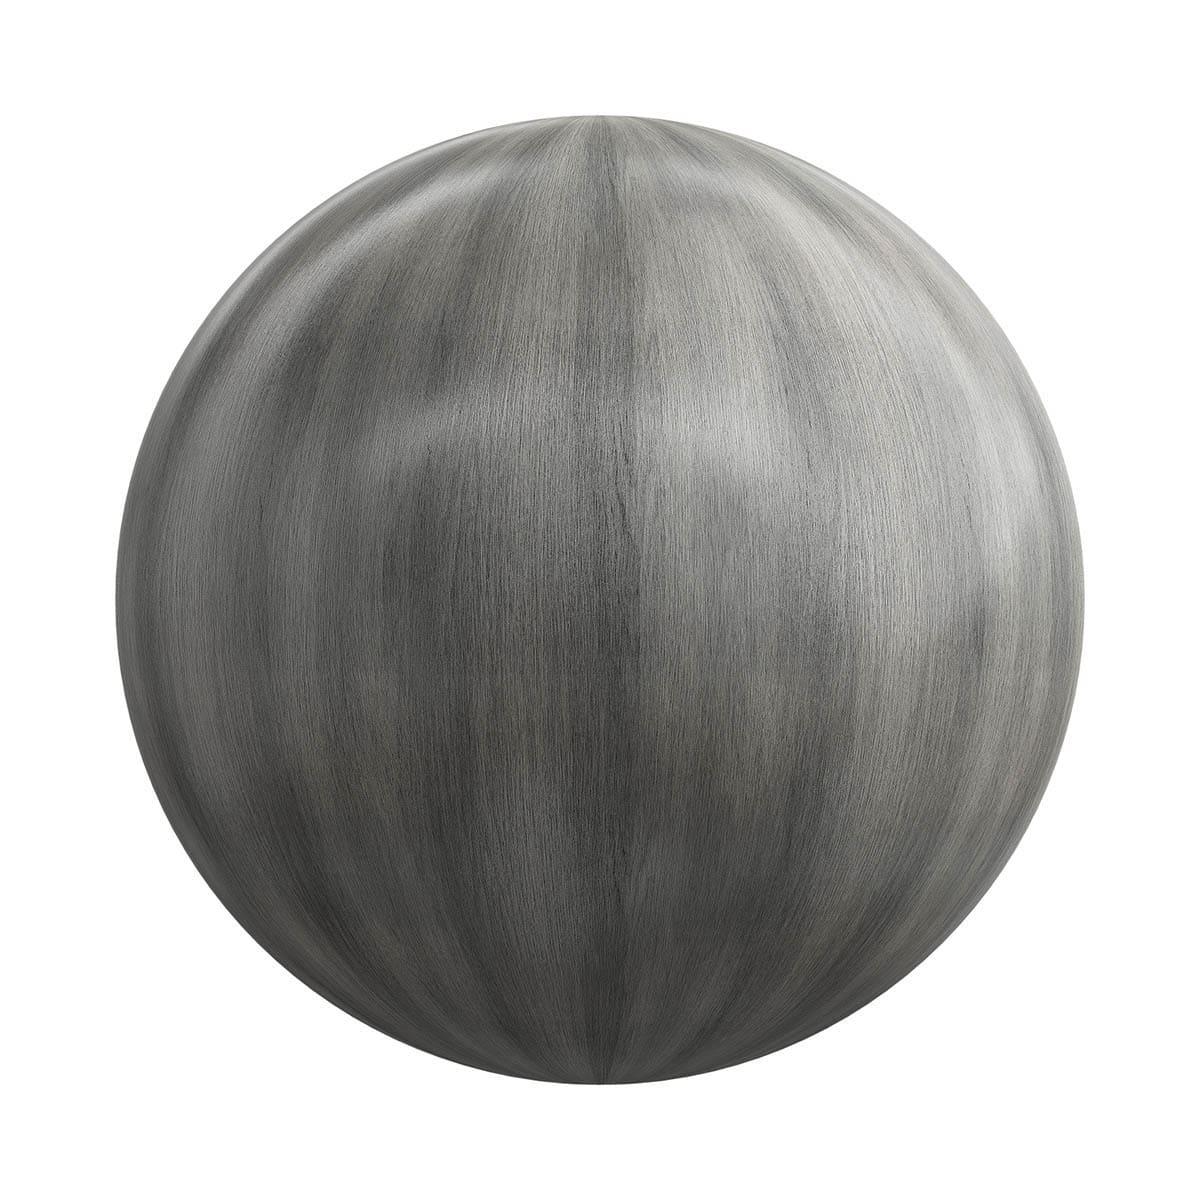 Black Fine Wood PBR Texture